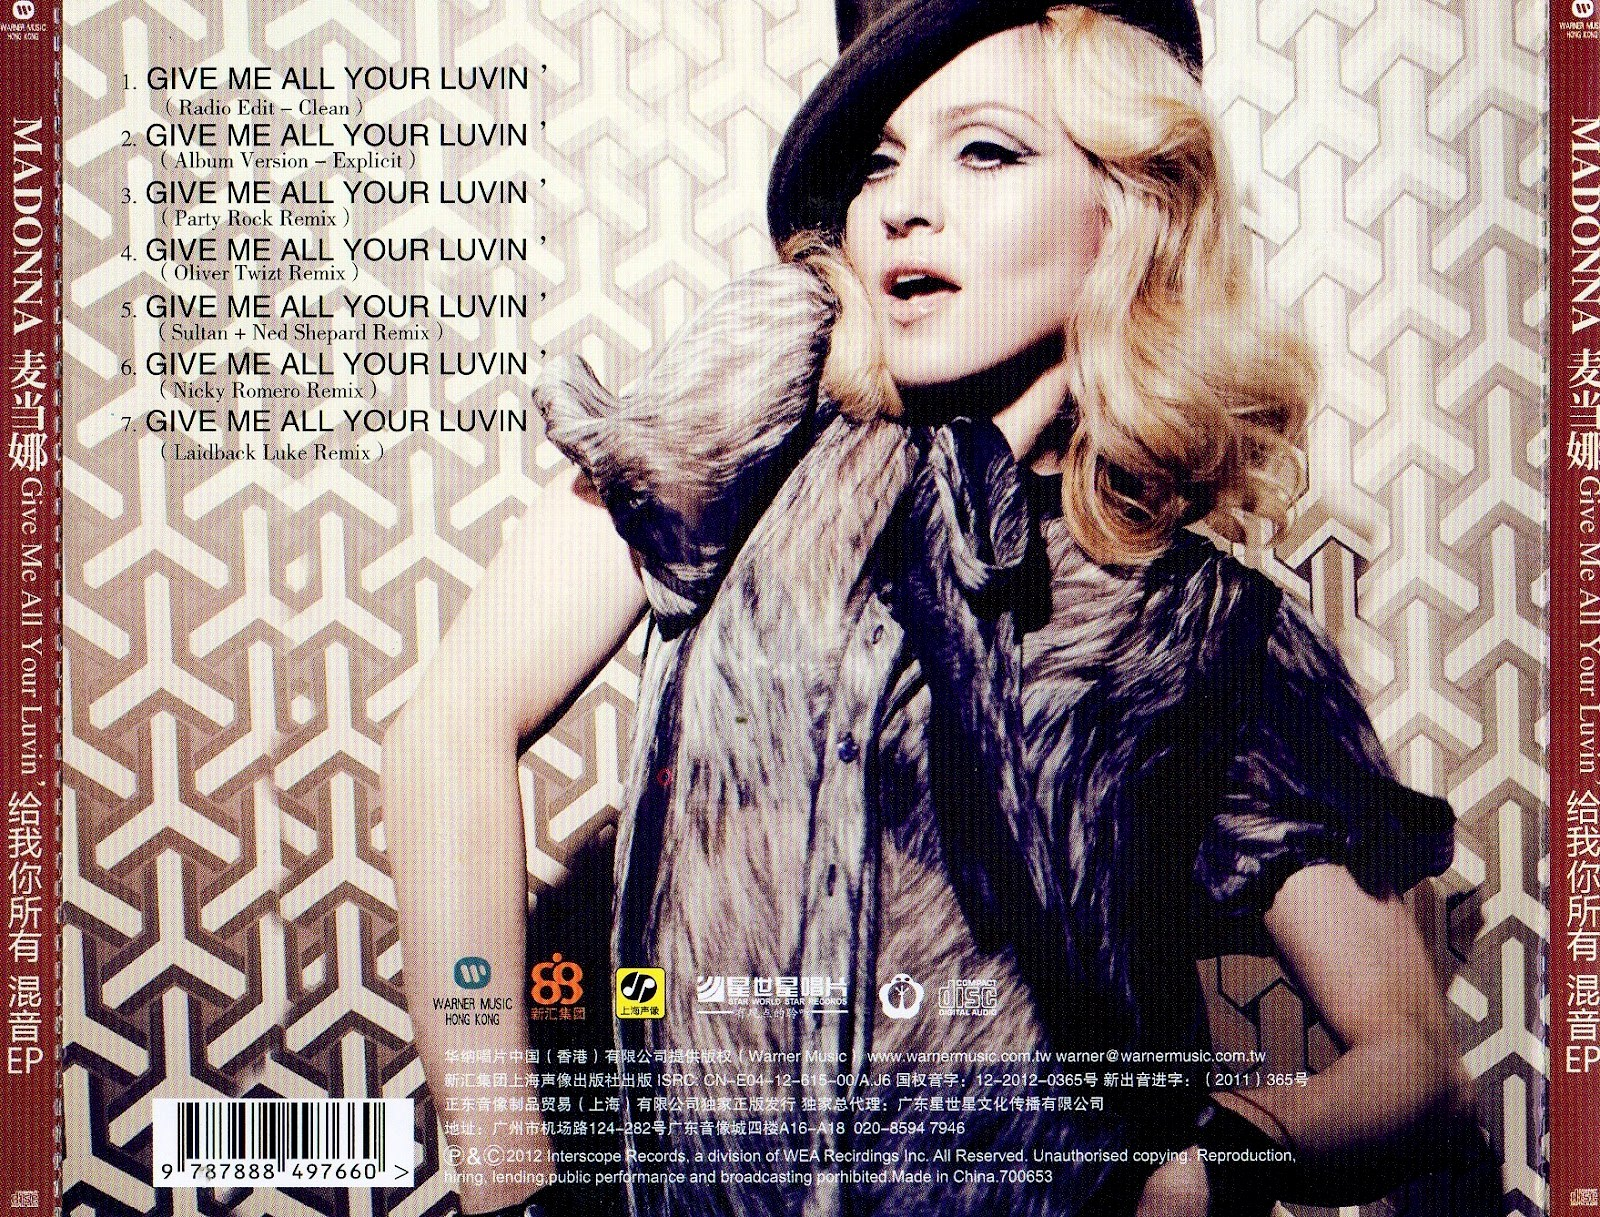 Amazoncom: give me all your luvin (madonna, mia  nicki minaj instrumental version): unknown: mp3 downloads